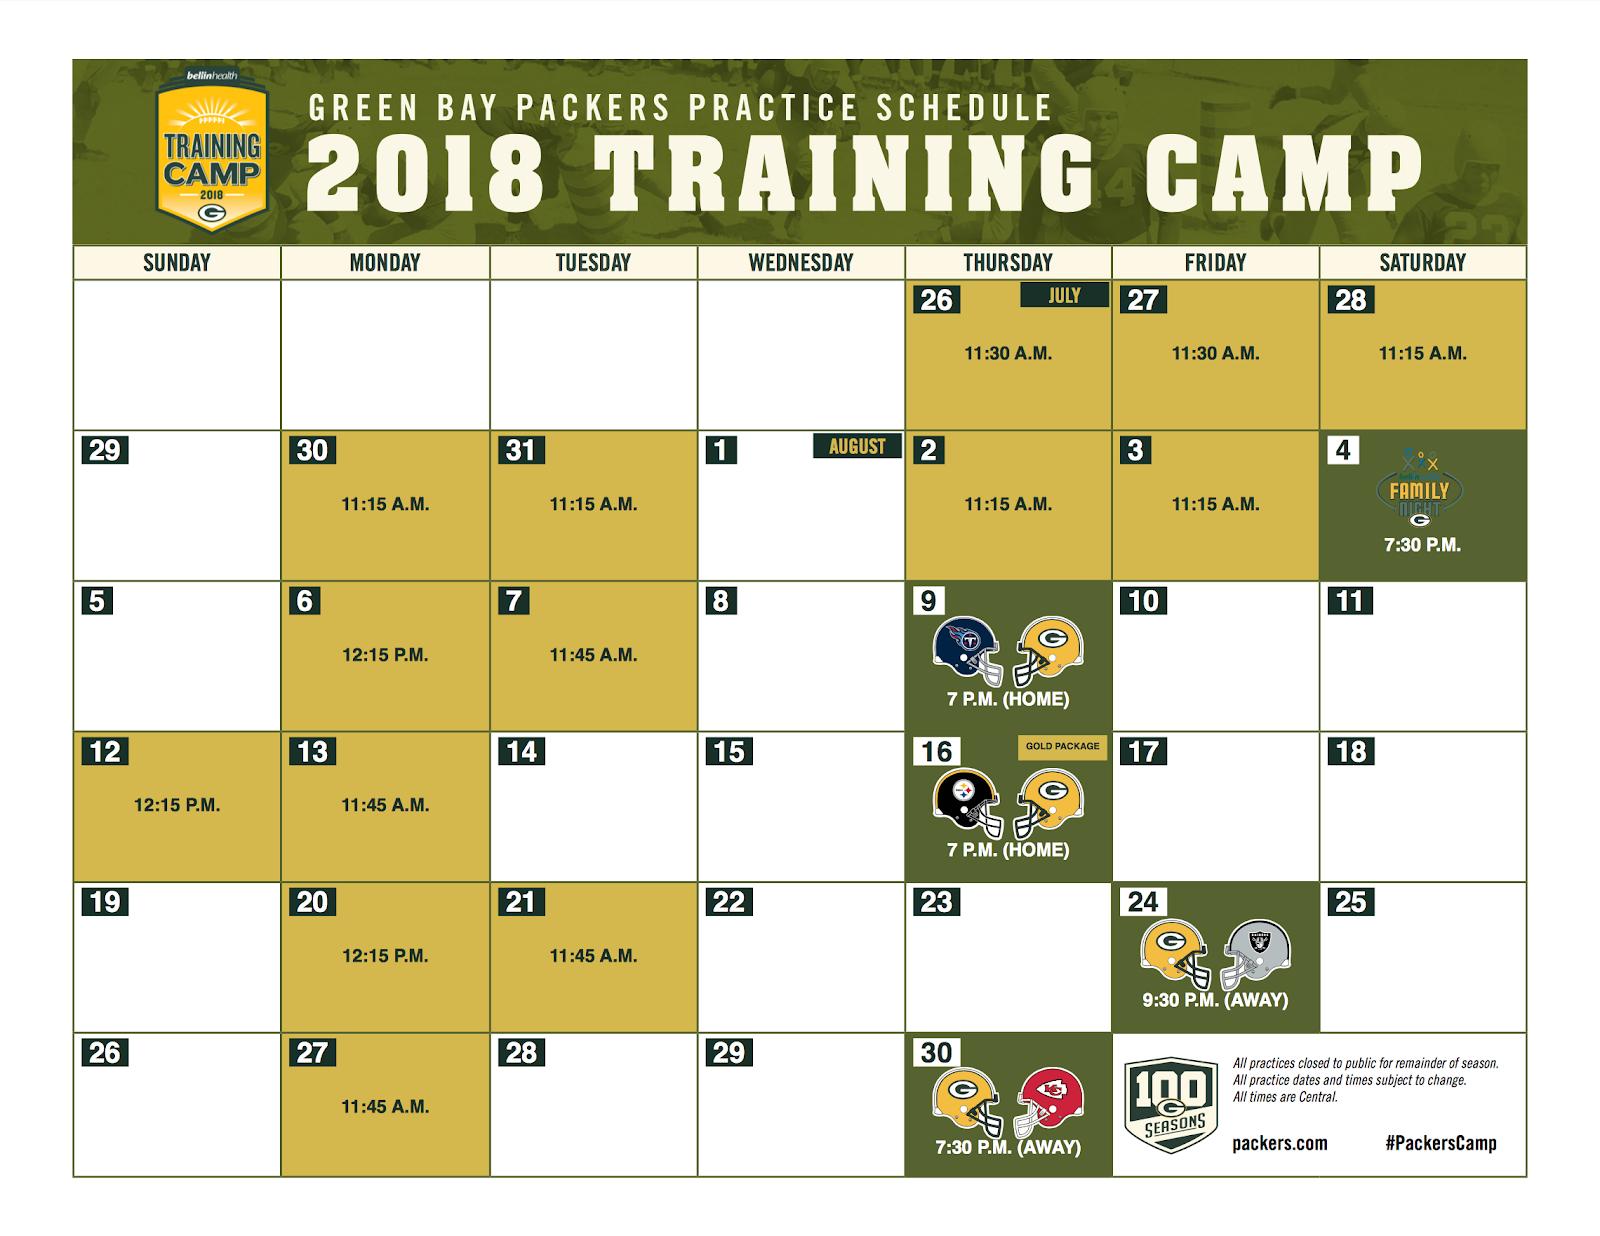 2018 training camp schedule